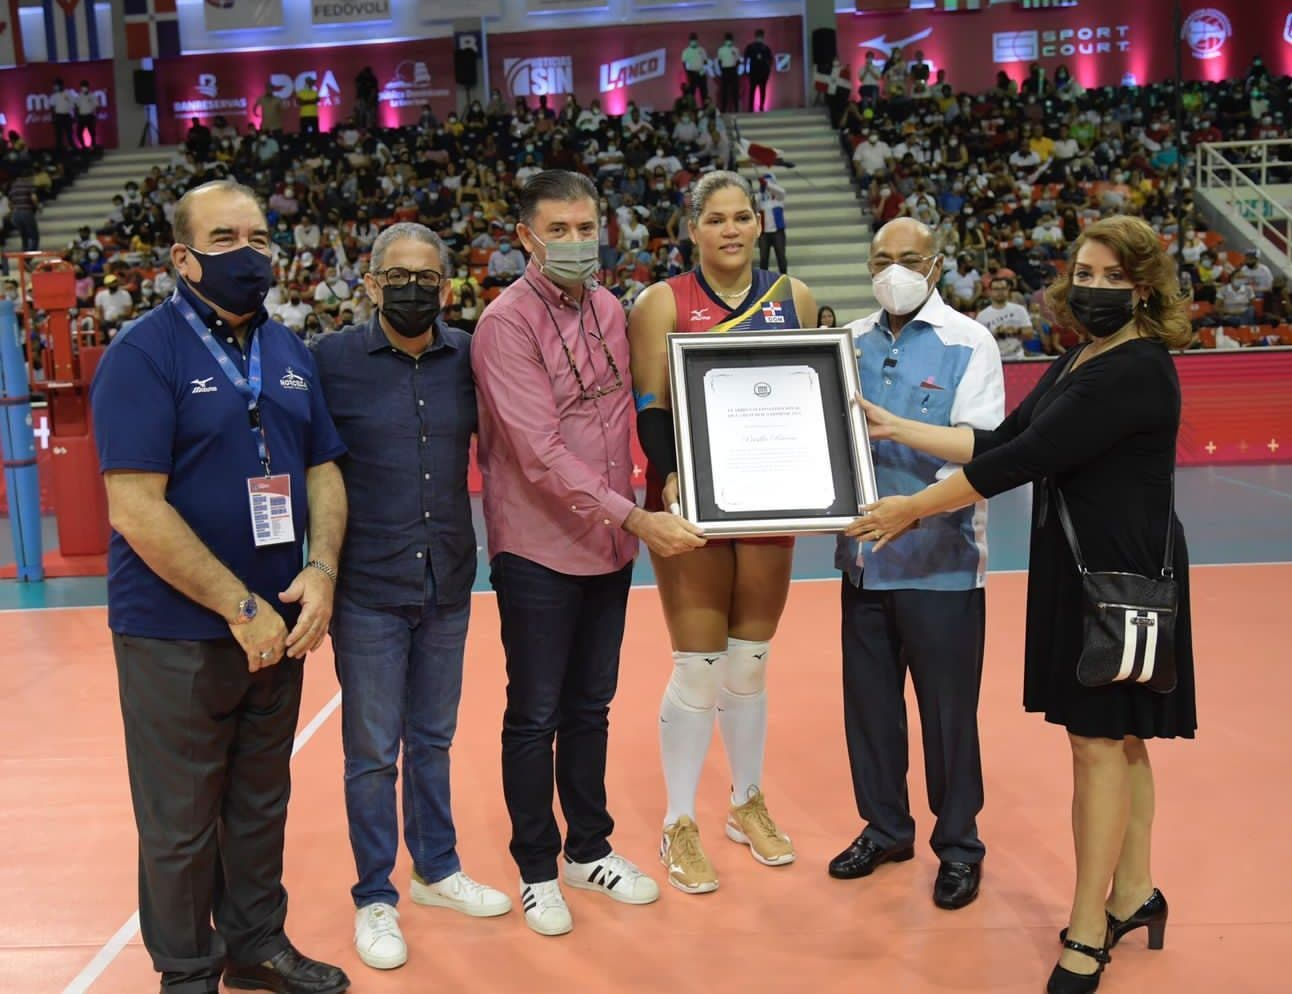 Tribunal Constitucional reconoce trayectoria de la atleta Priscilla Rivera